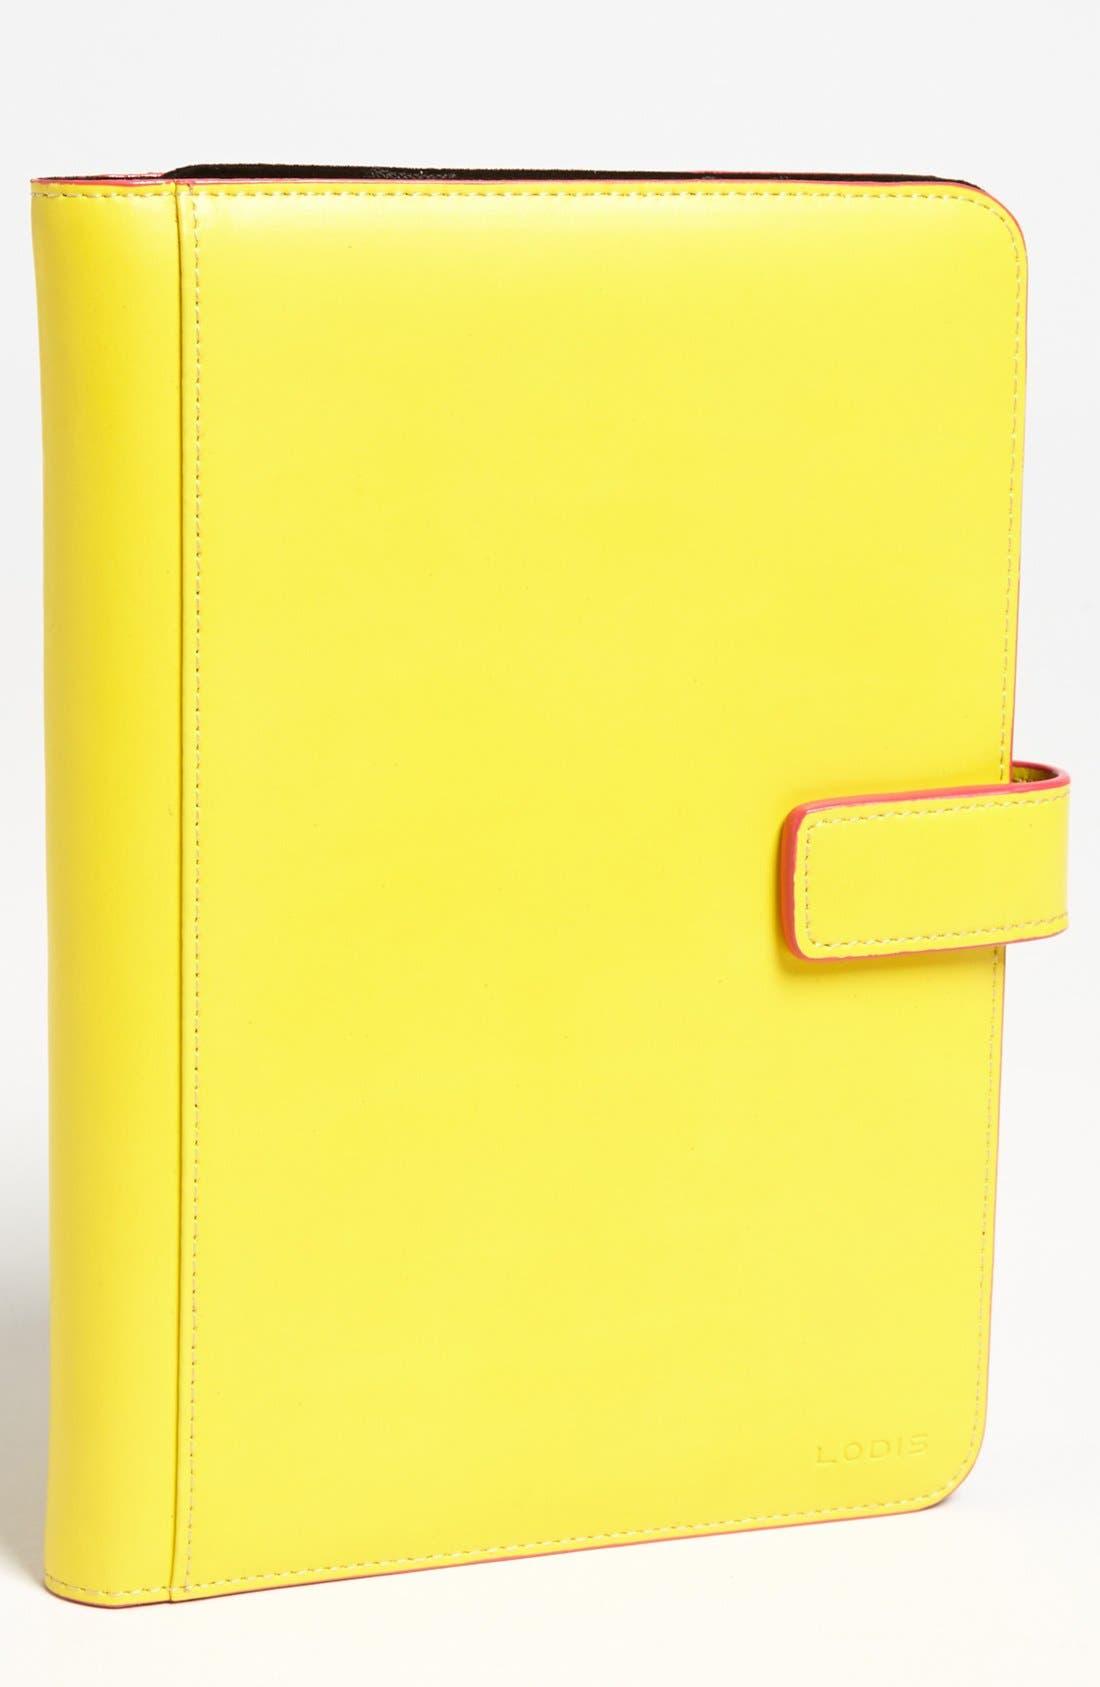 Main Image - Lodis 'Swivel' iPad mini Case